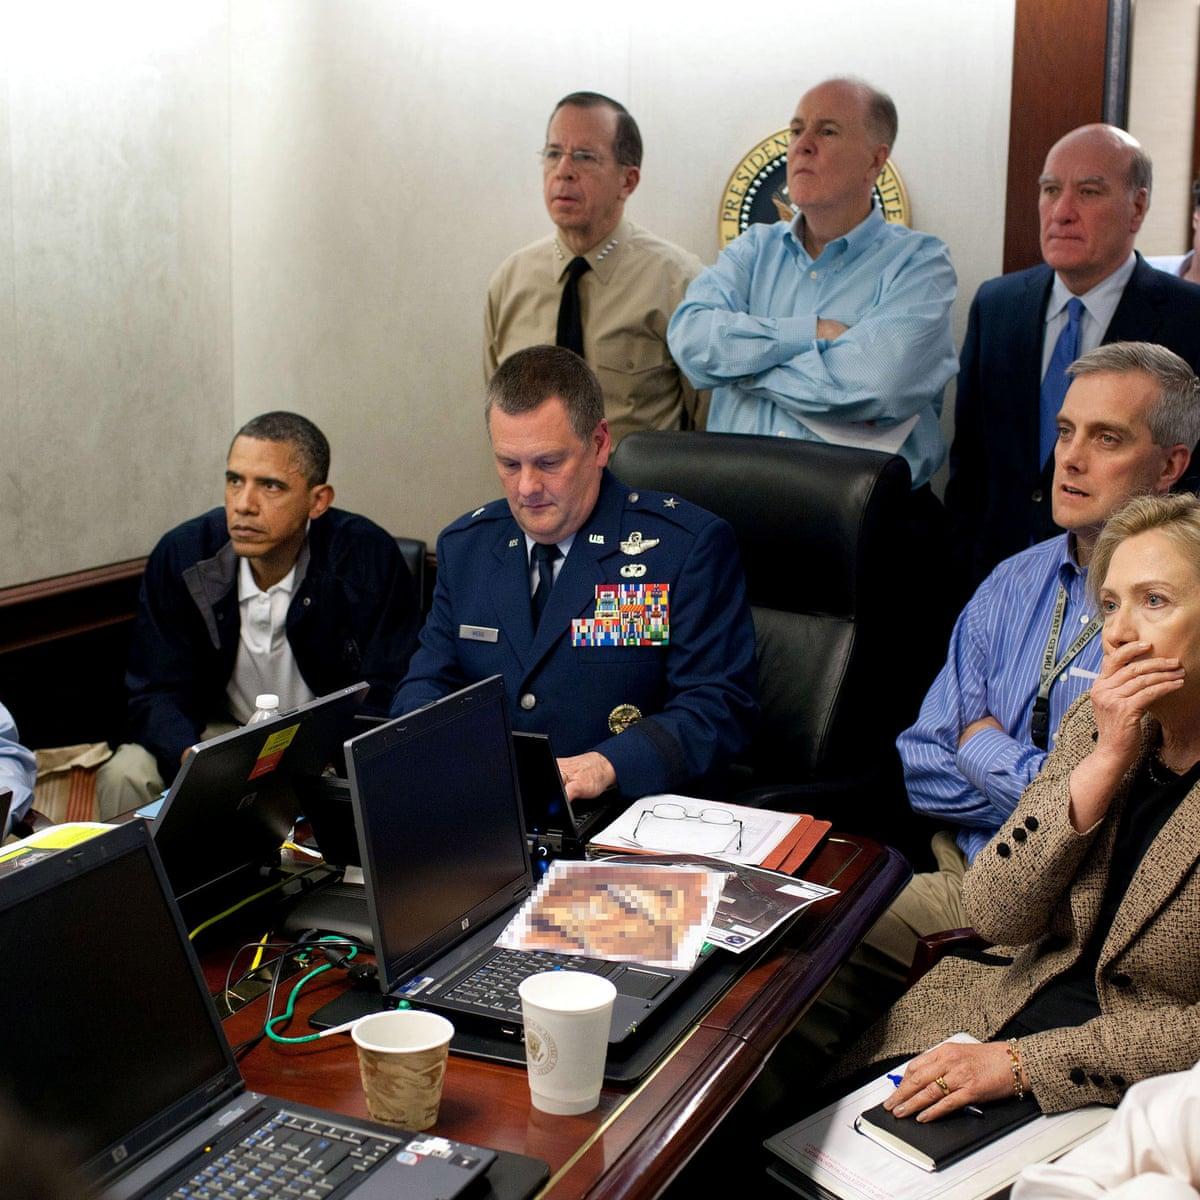 Joe Biden advised against Osama bin Laden raid, Barack Obama writes | Joe Biden | The Guardian